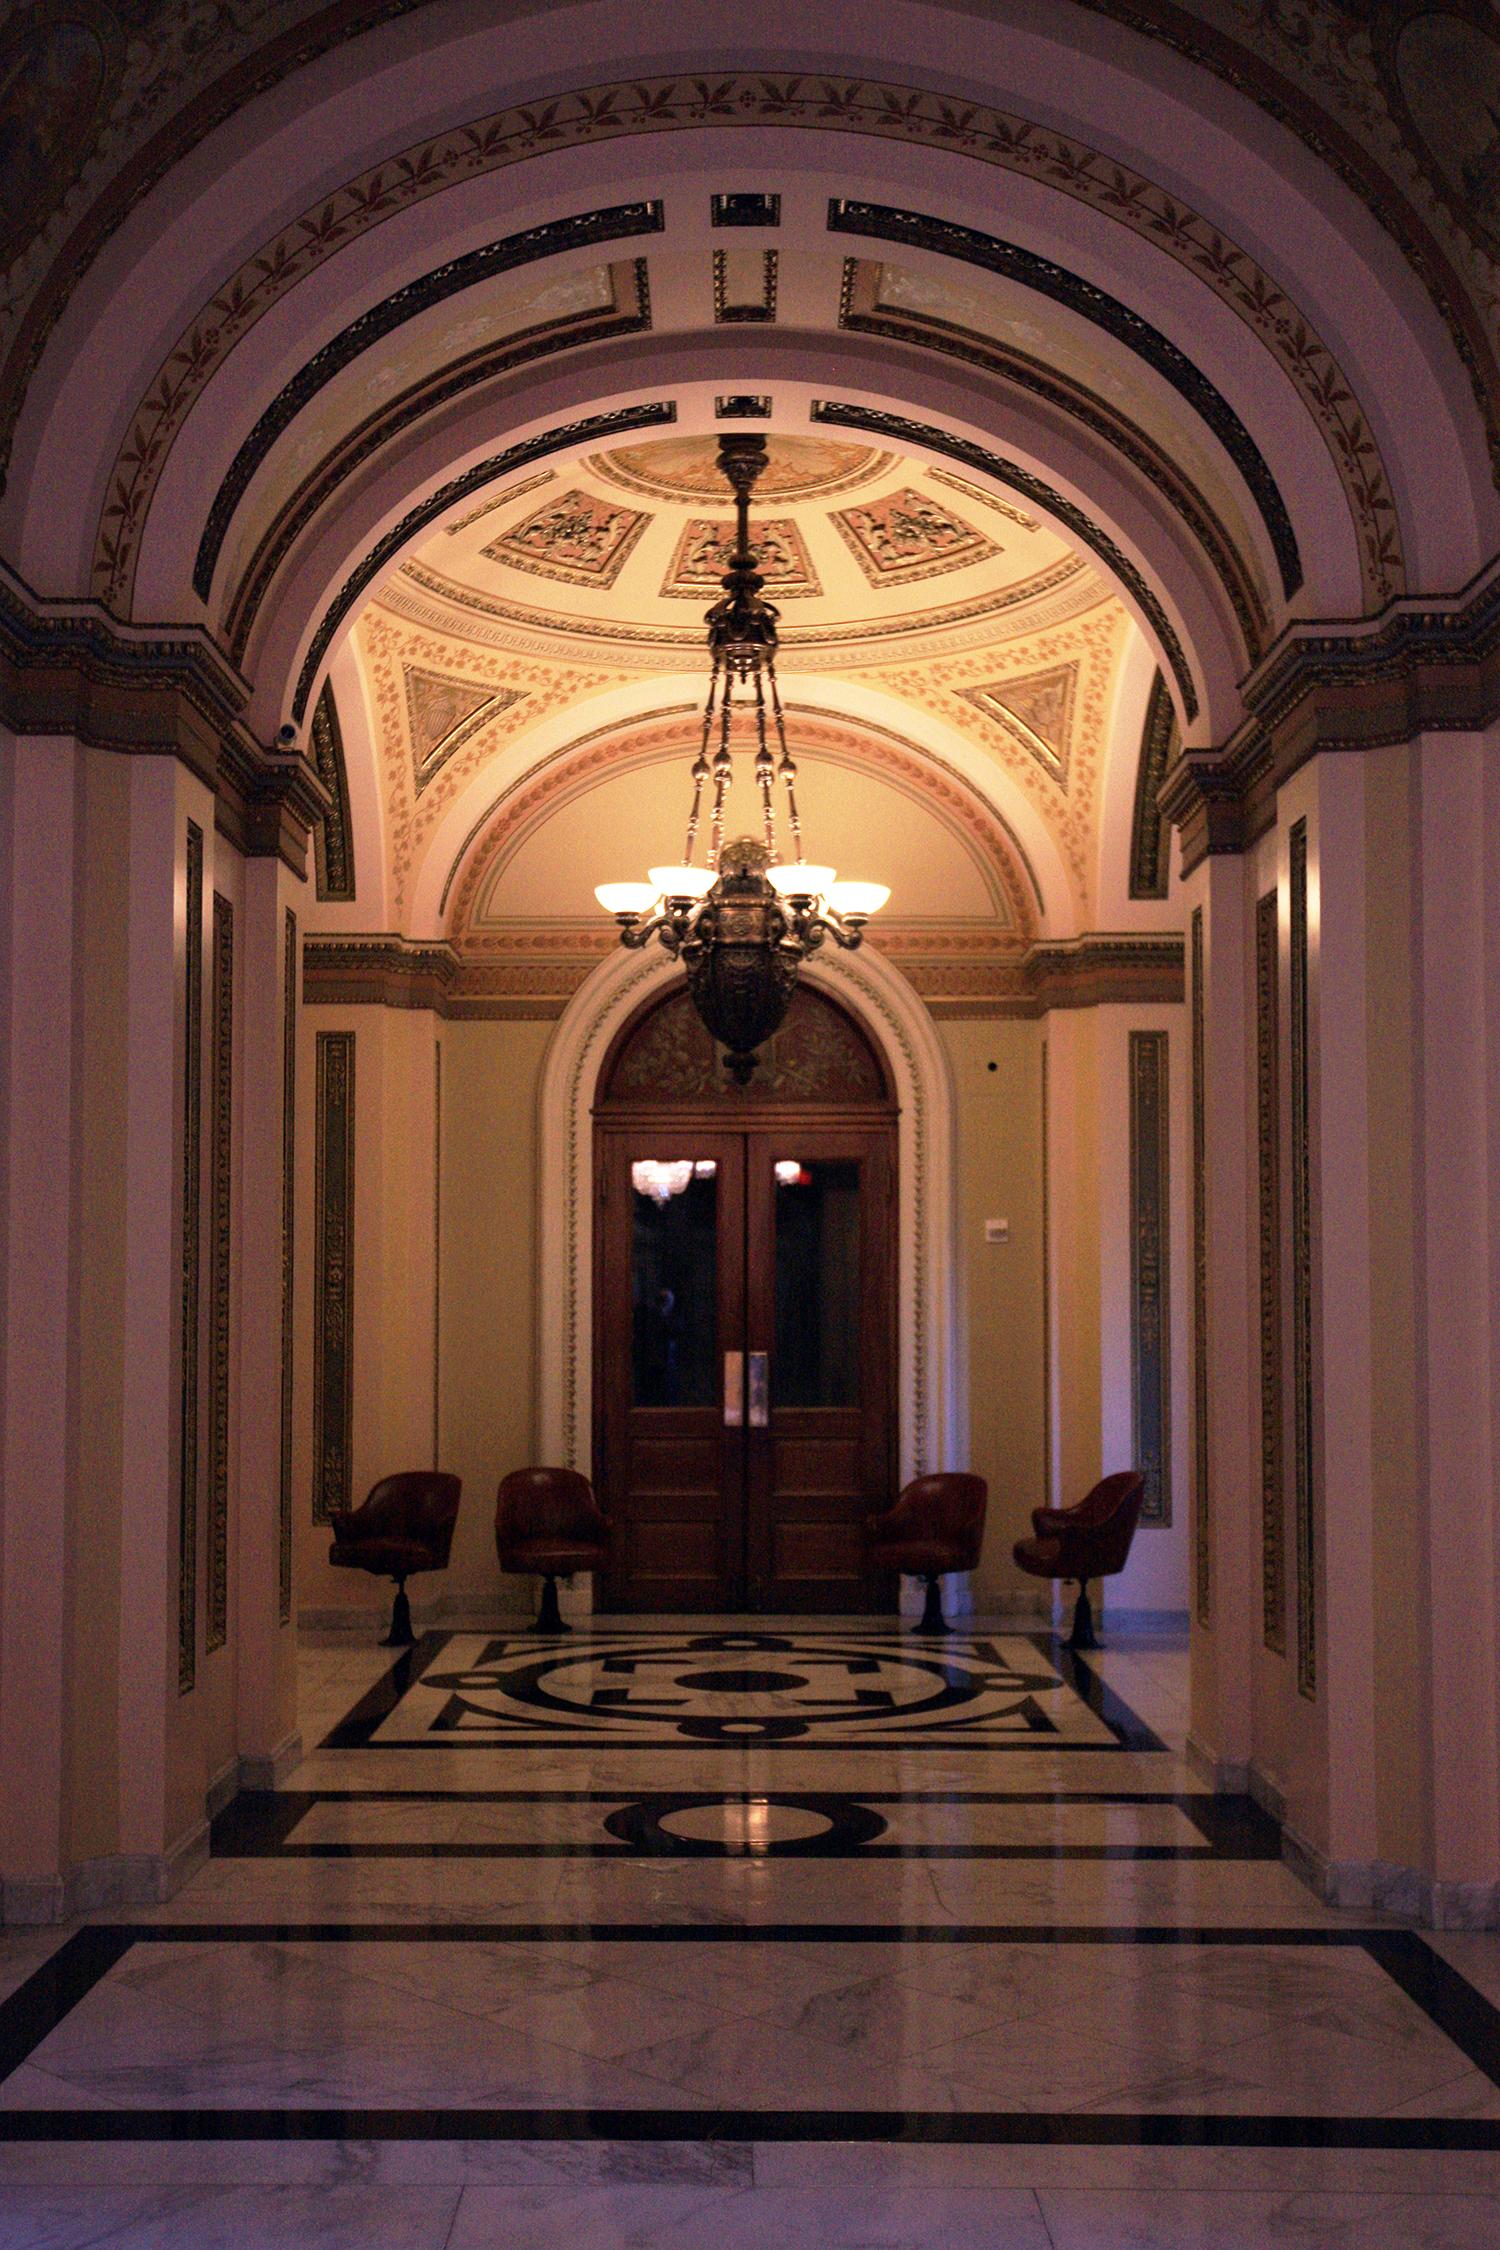 The Presidential Entrance